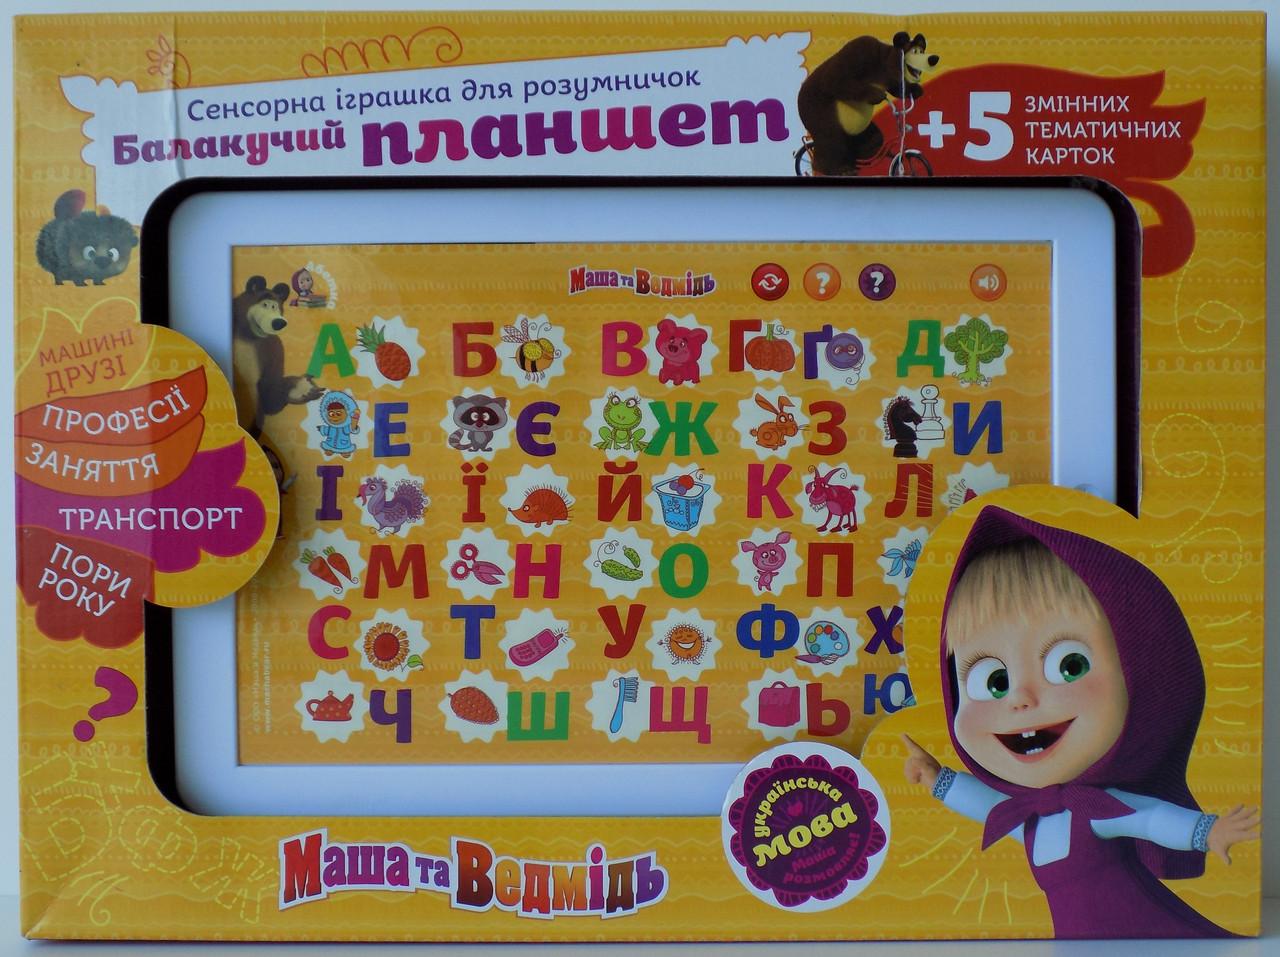 Балакучий планшет Маша і ведмідь сенсорна гра абетка